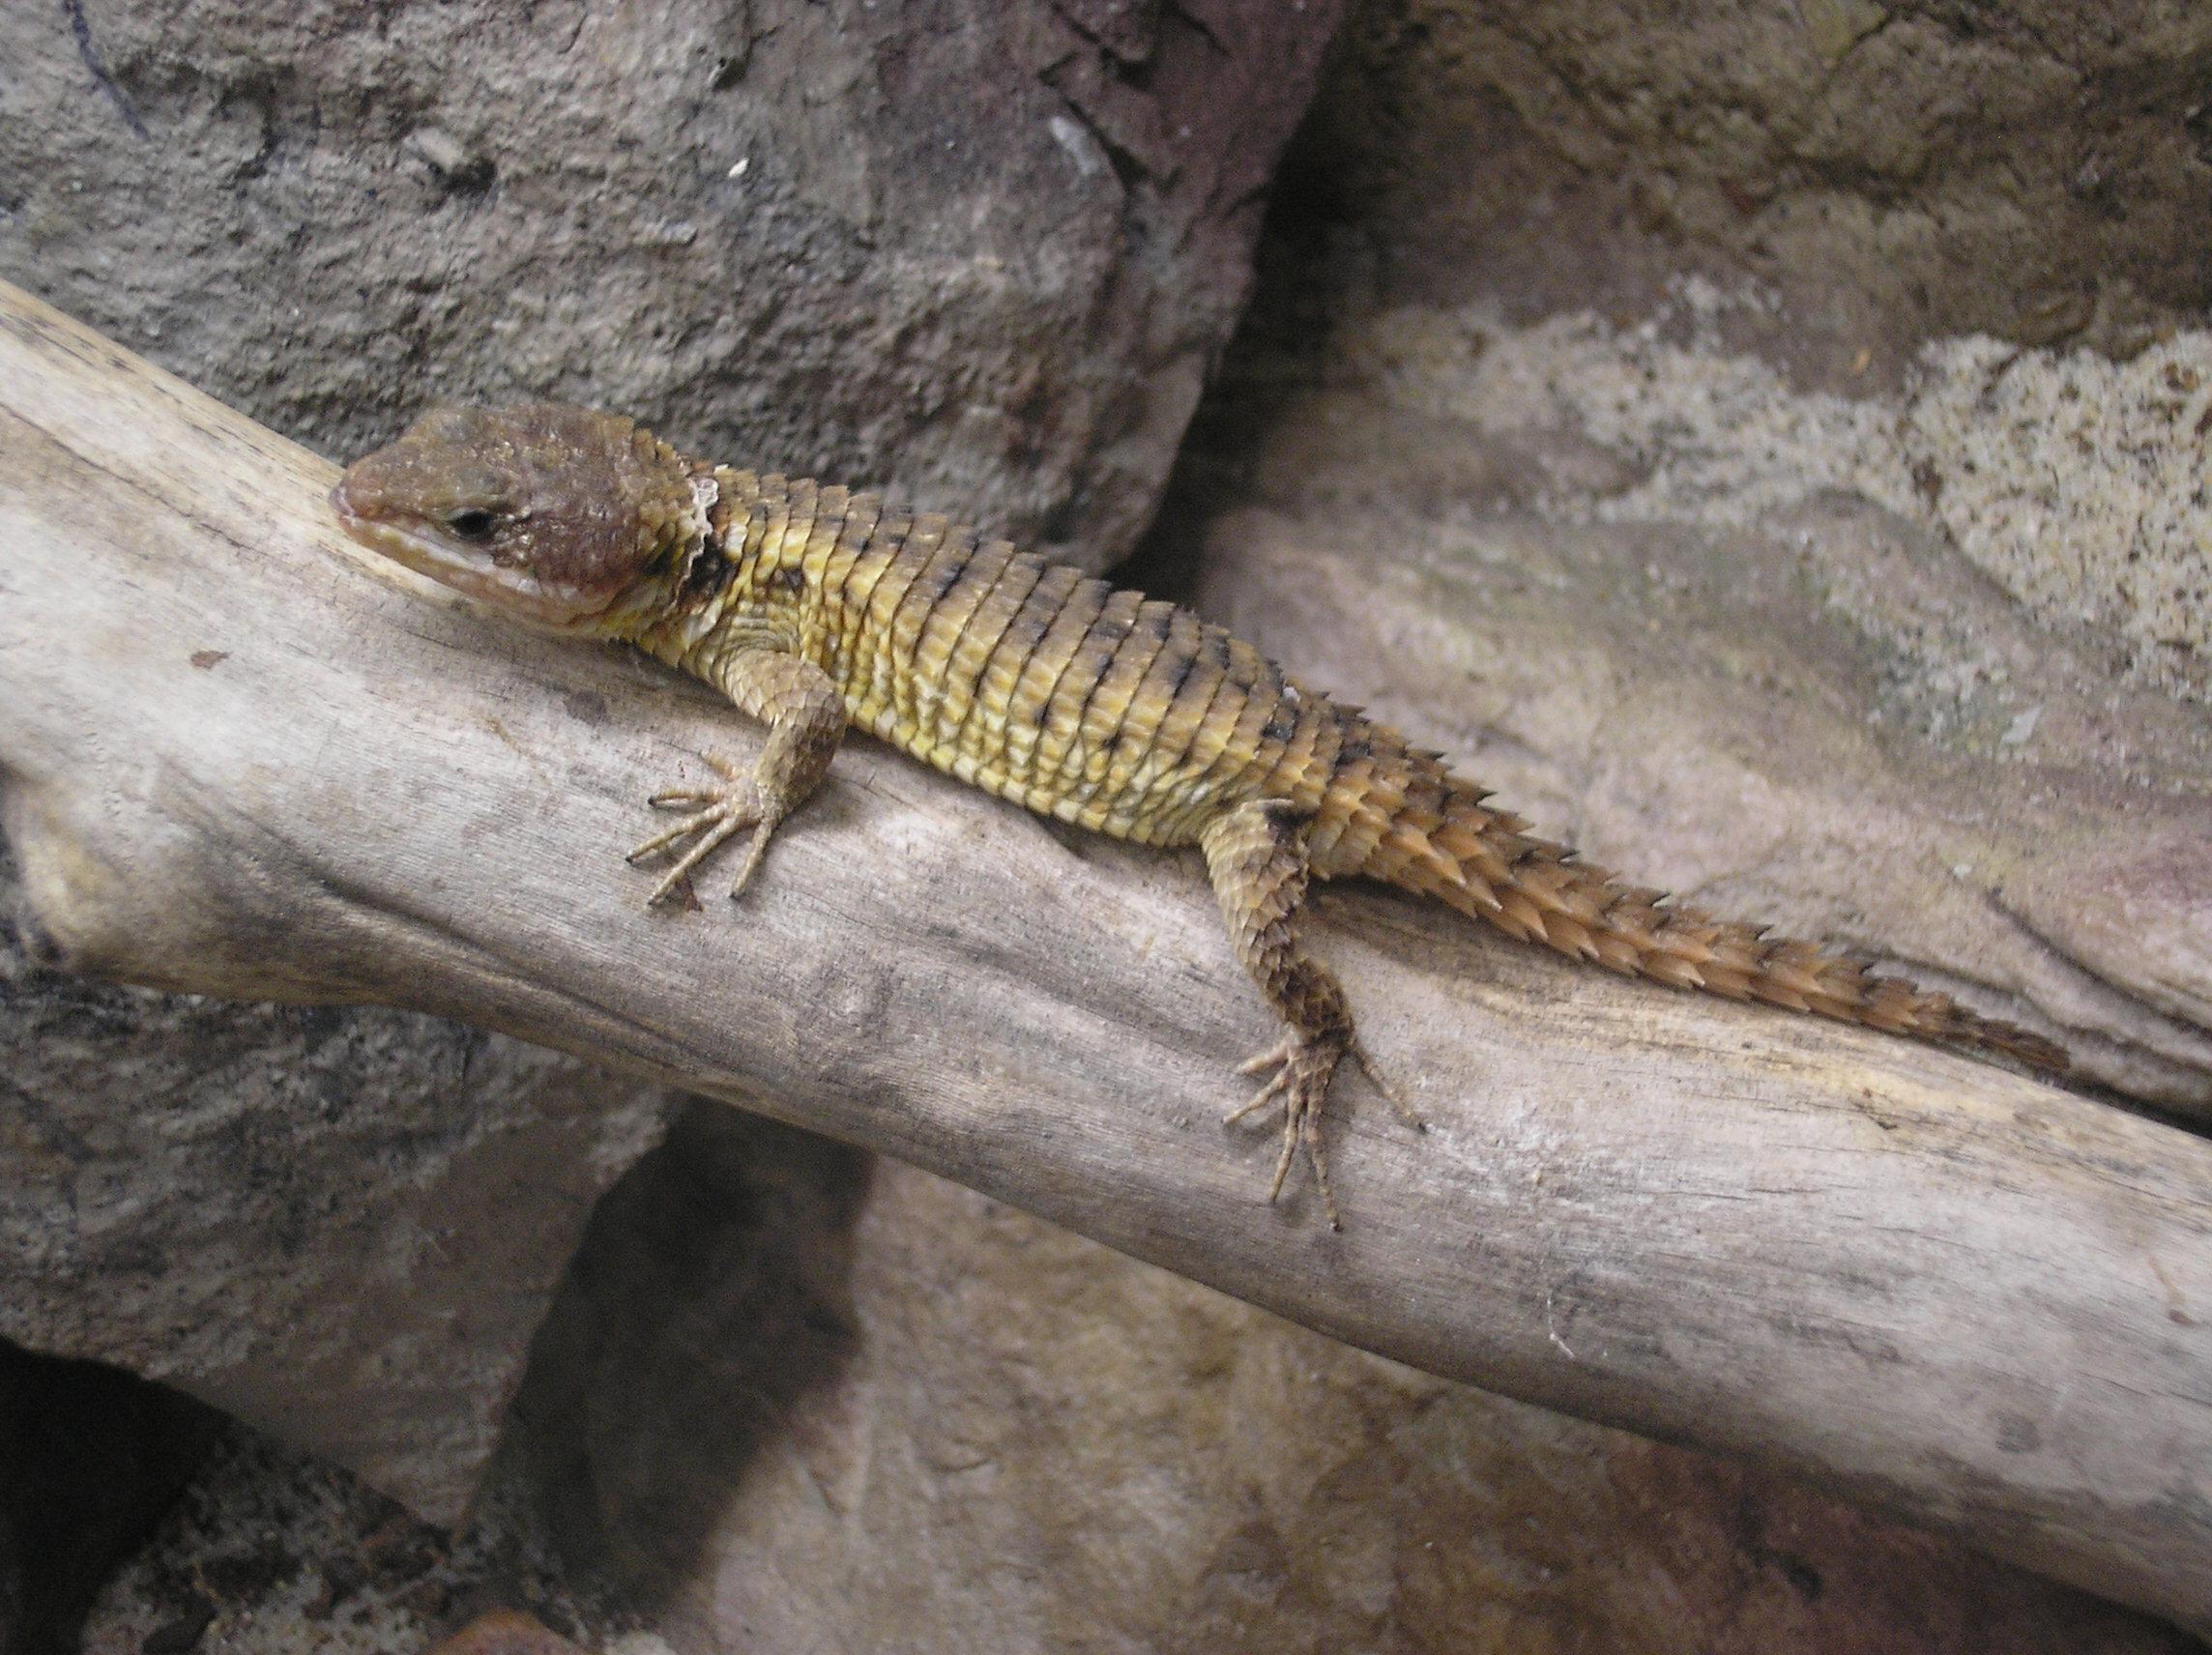 https://upload.wikimedia.org/wikipedia/commons/a/ad/Tropical_Girdled_Lizard_P9240103.JPG